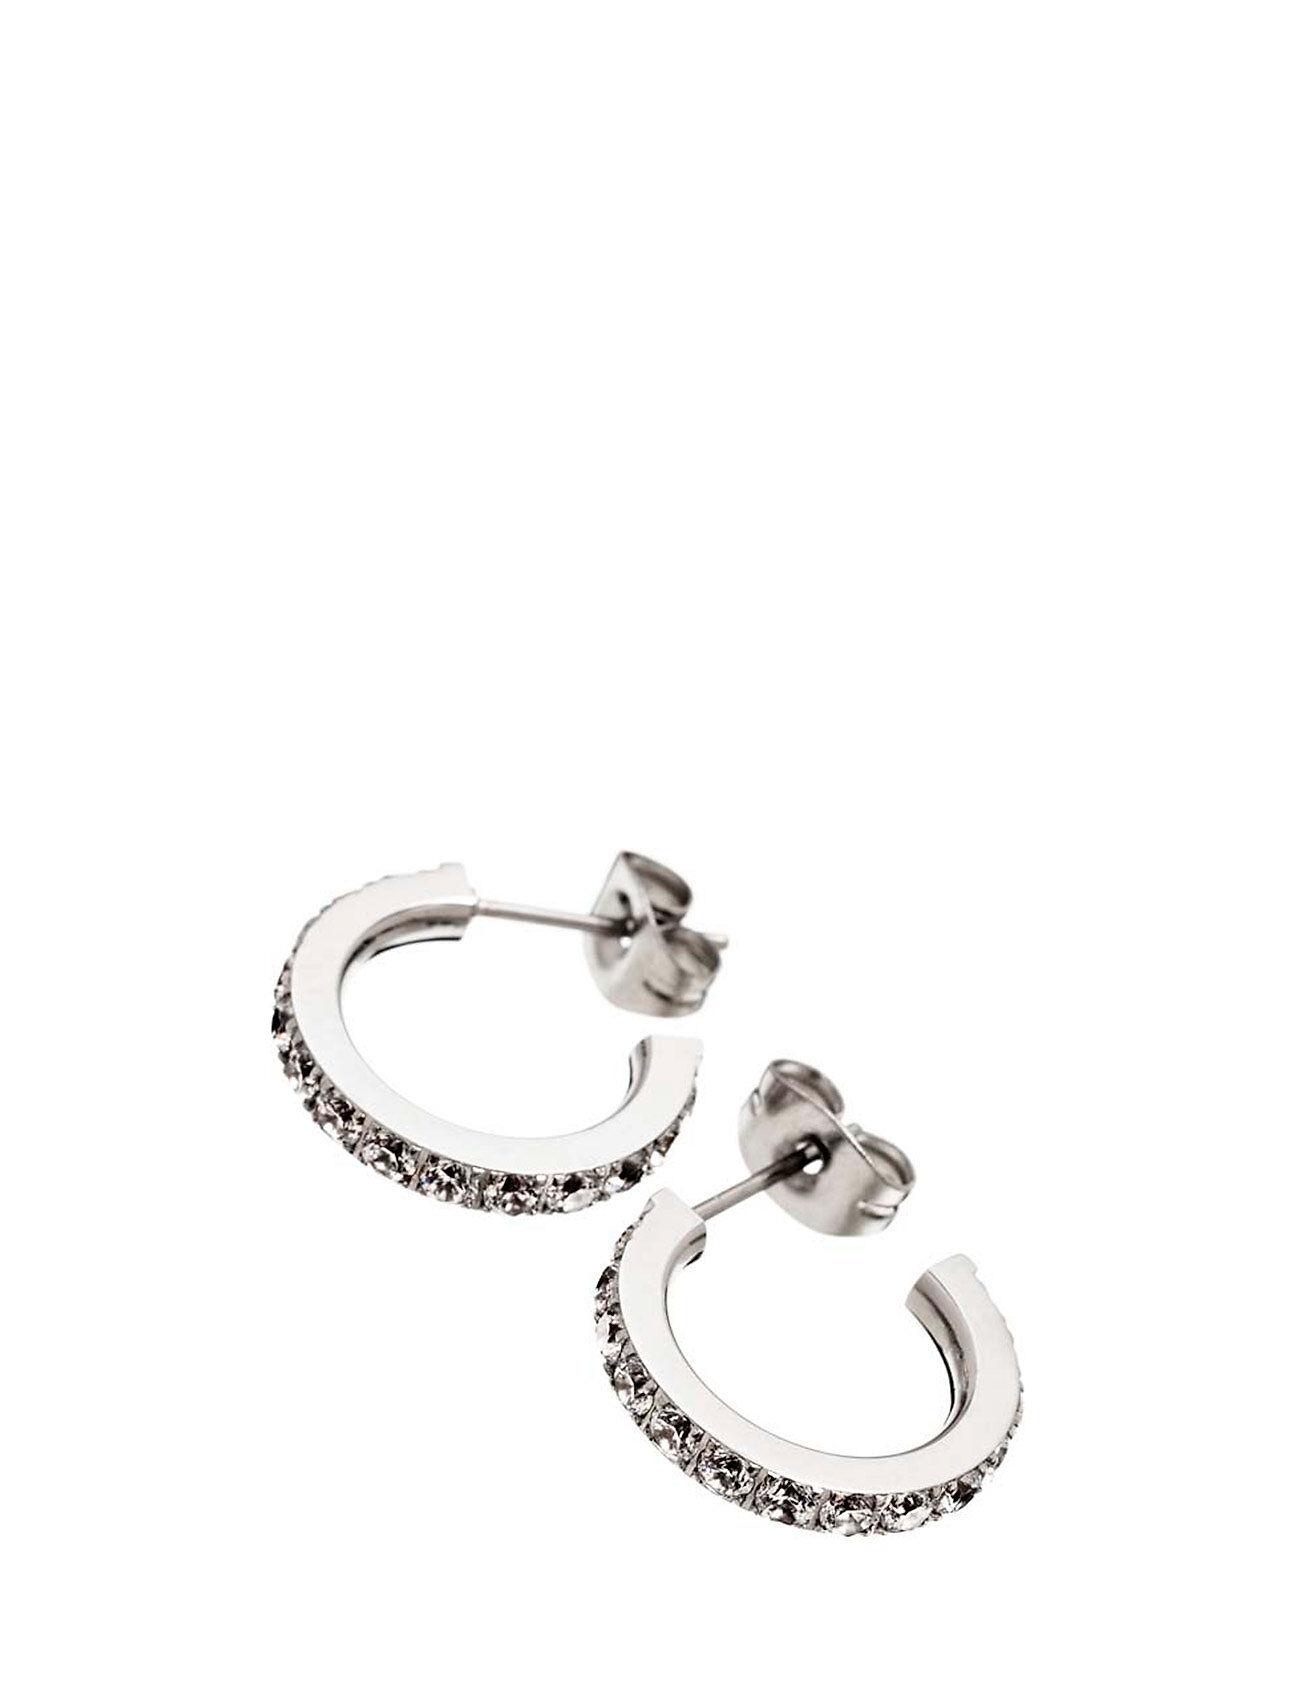 Edblad Glow Earrings Mini Accessories Jewellery Earrings Hoops Hopea Edblad